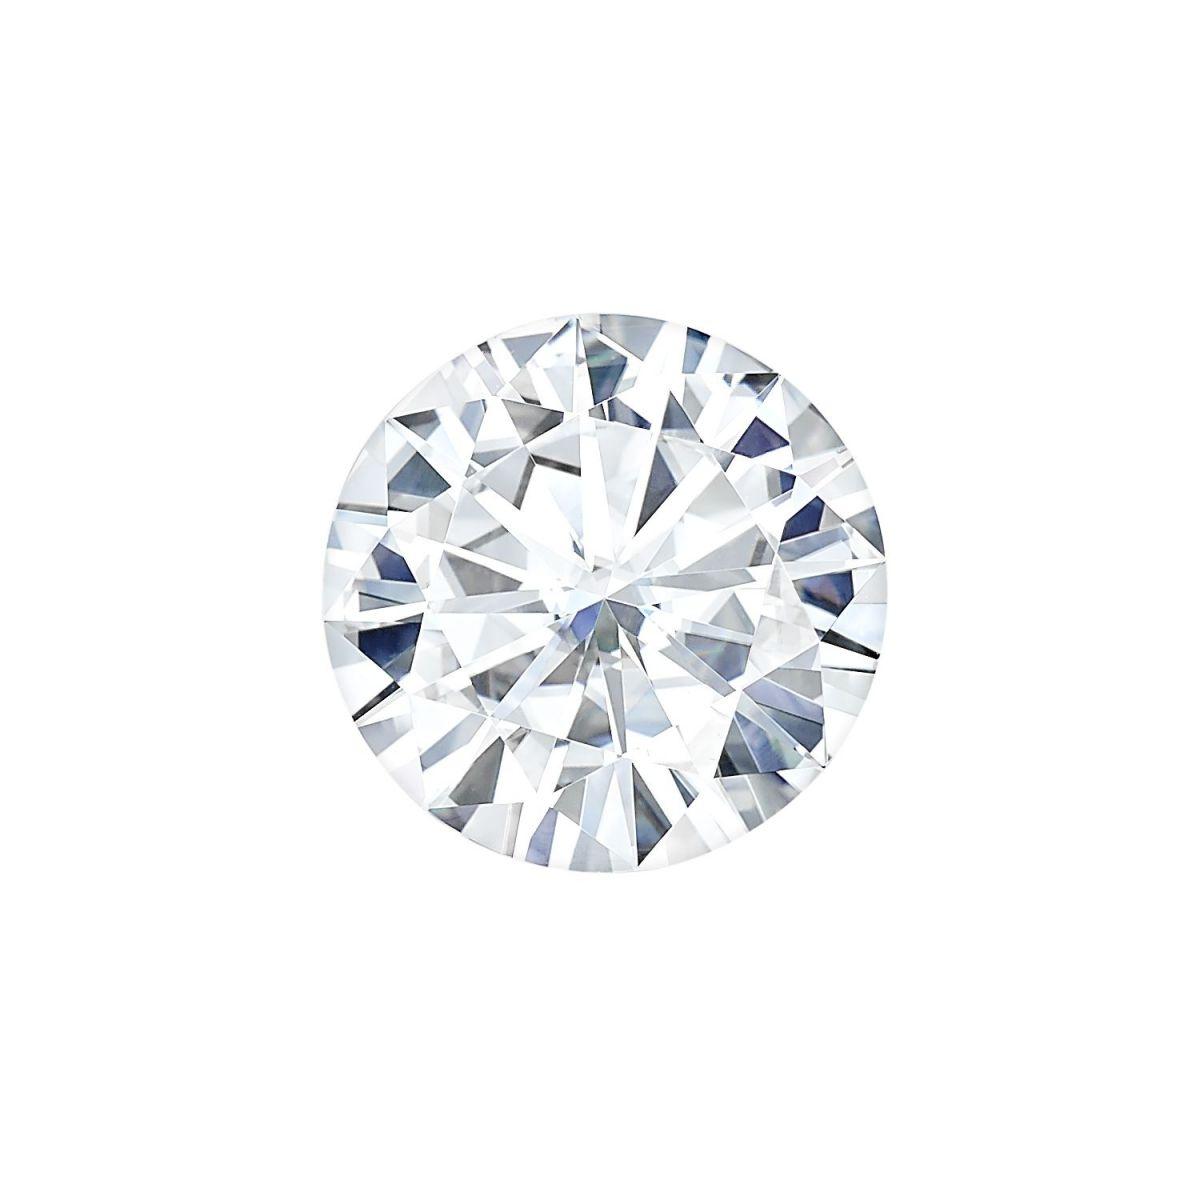 https://www.loveandpromisejewelers.com/media/catalog/product/cache/feefdef027ccf0d59dd1fef51db0610e/r/o/round_moissanite_image_1.jpg